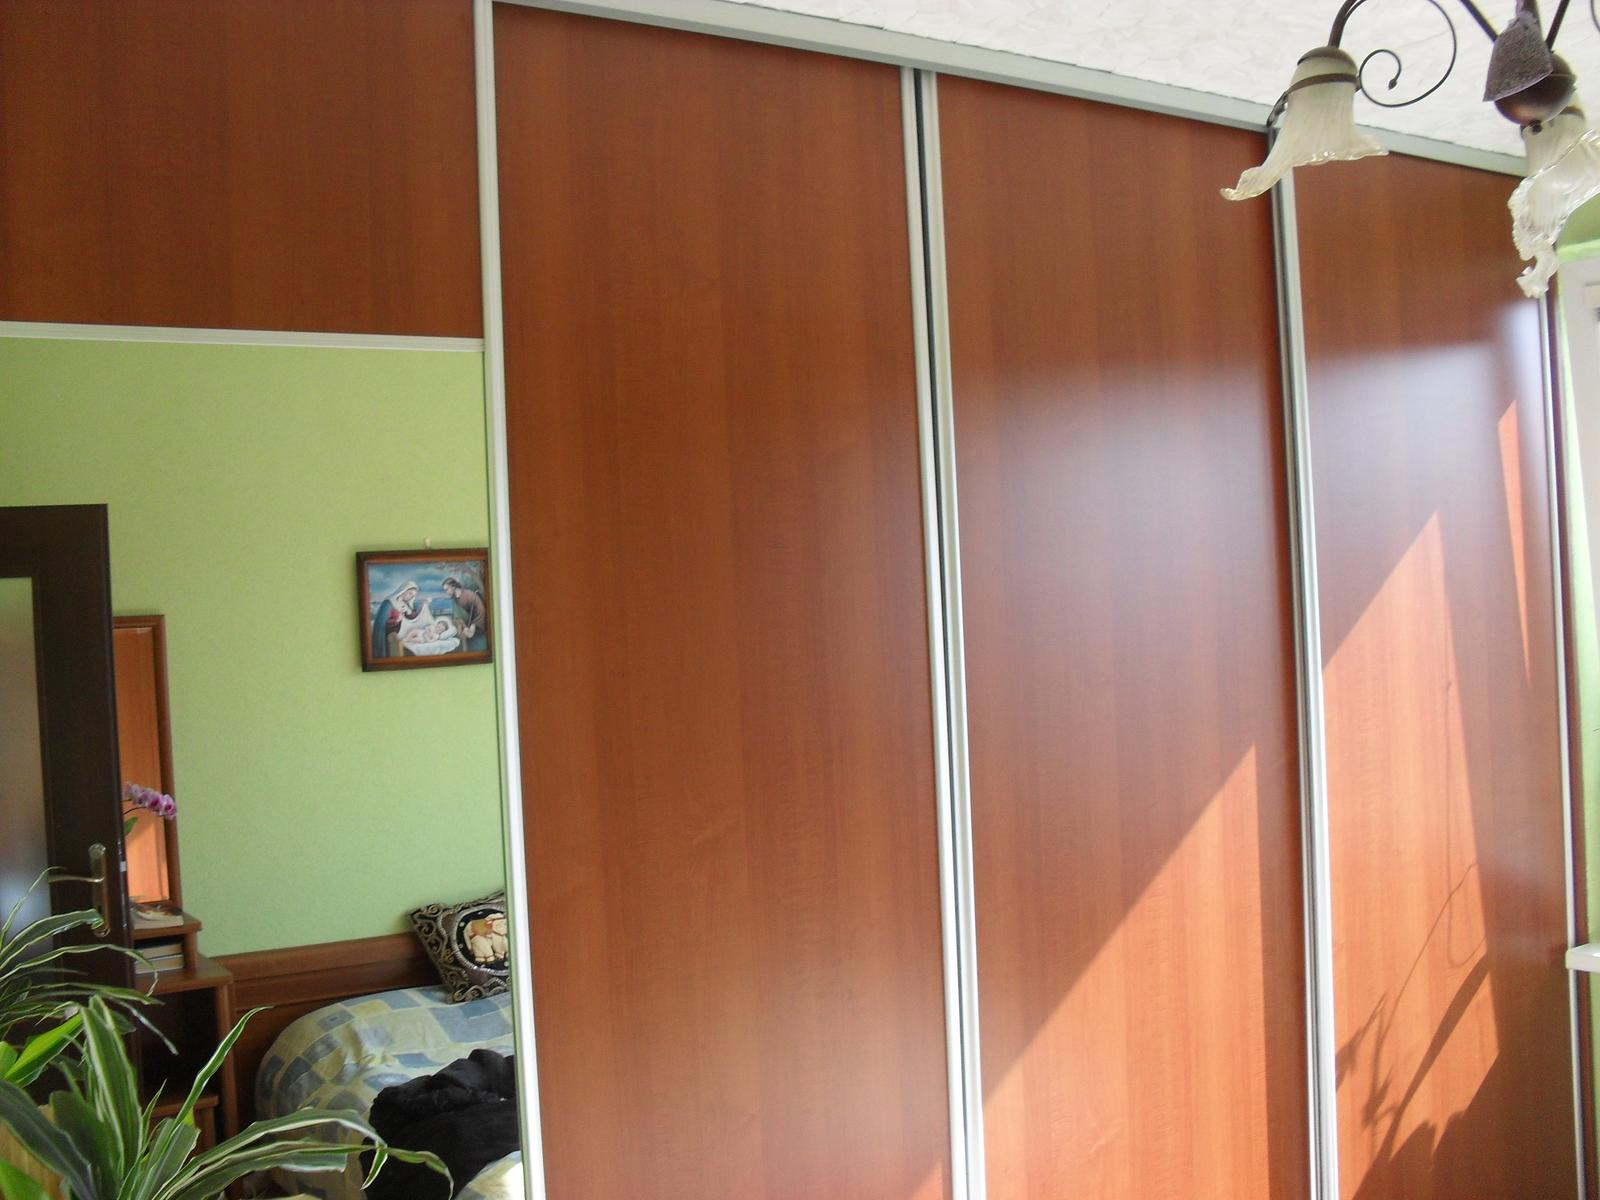 Vstavané skrine Martin Benko Bošany - Obrázok č. 25